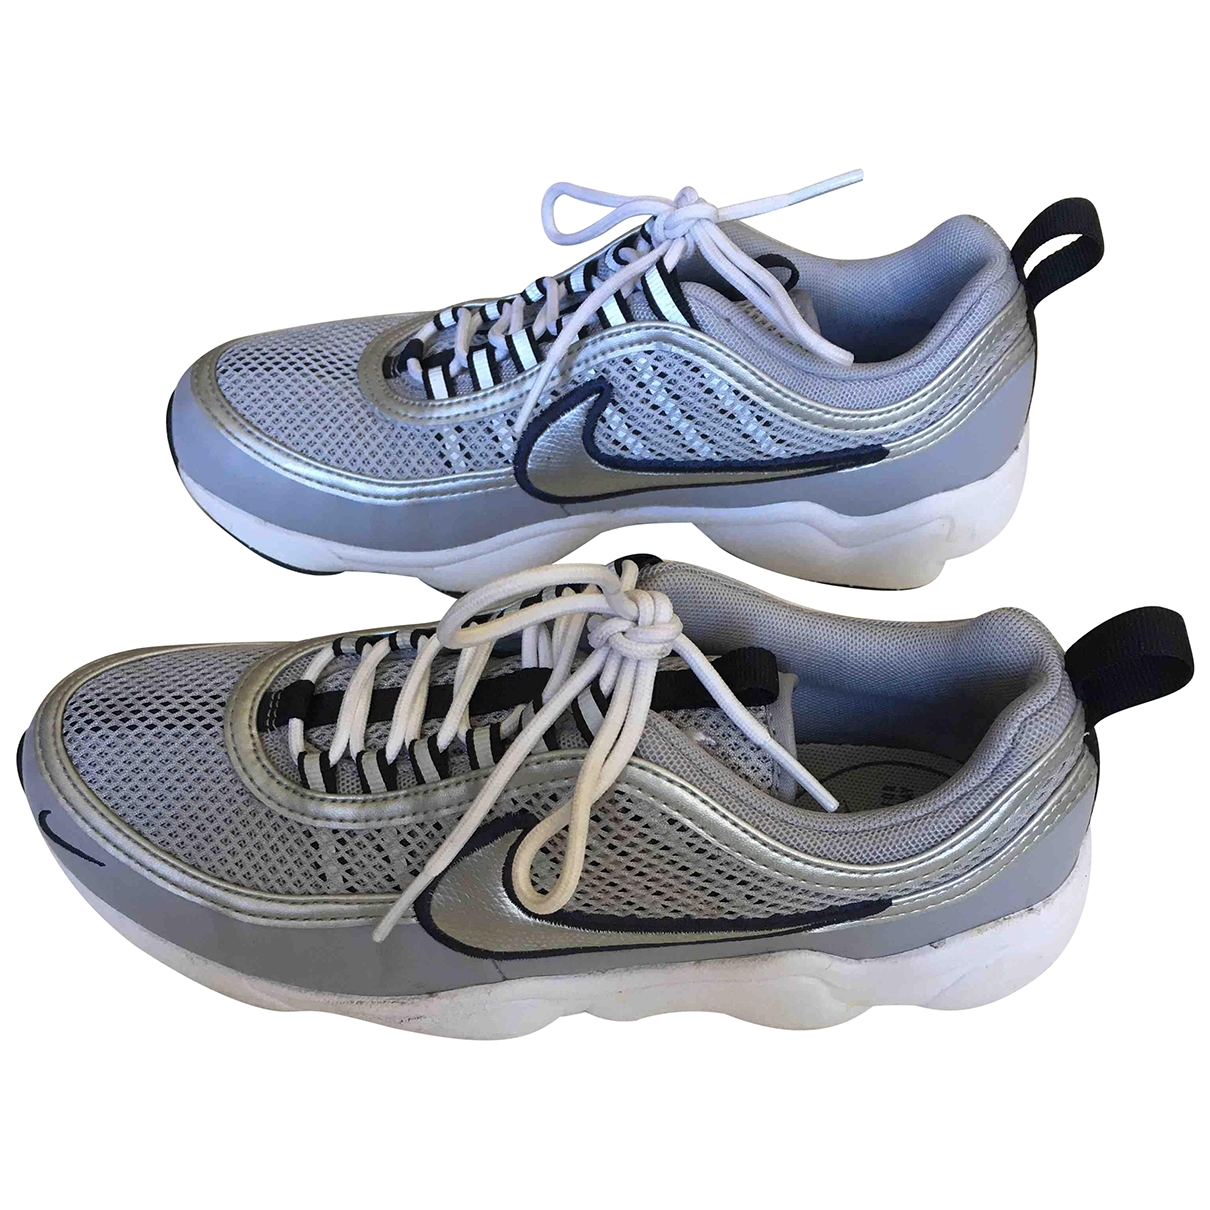 Nike - Baskets Air Zoom Spiridon pour femme en toile - gris